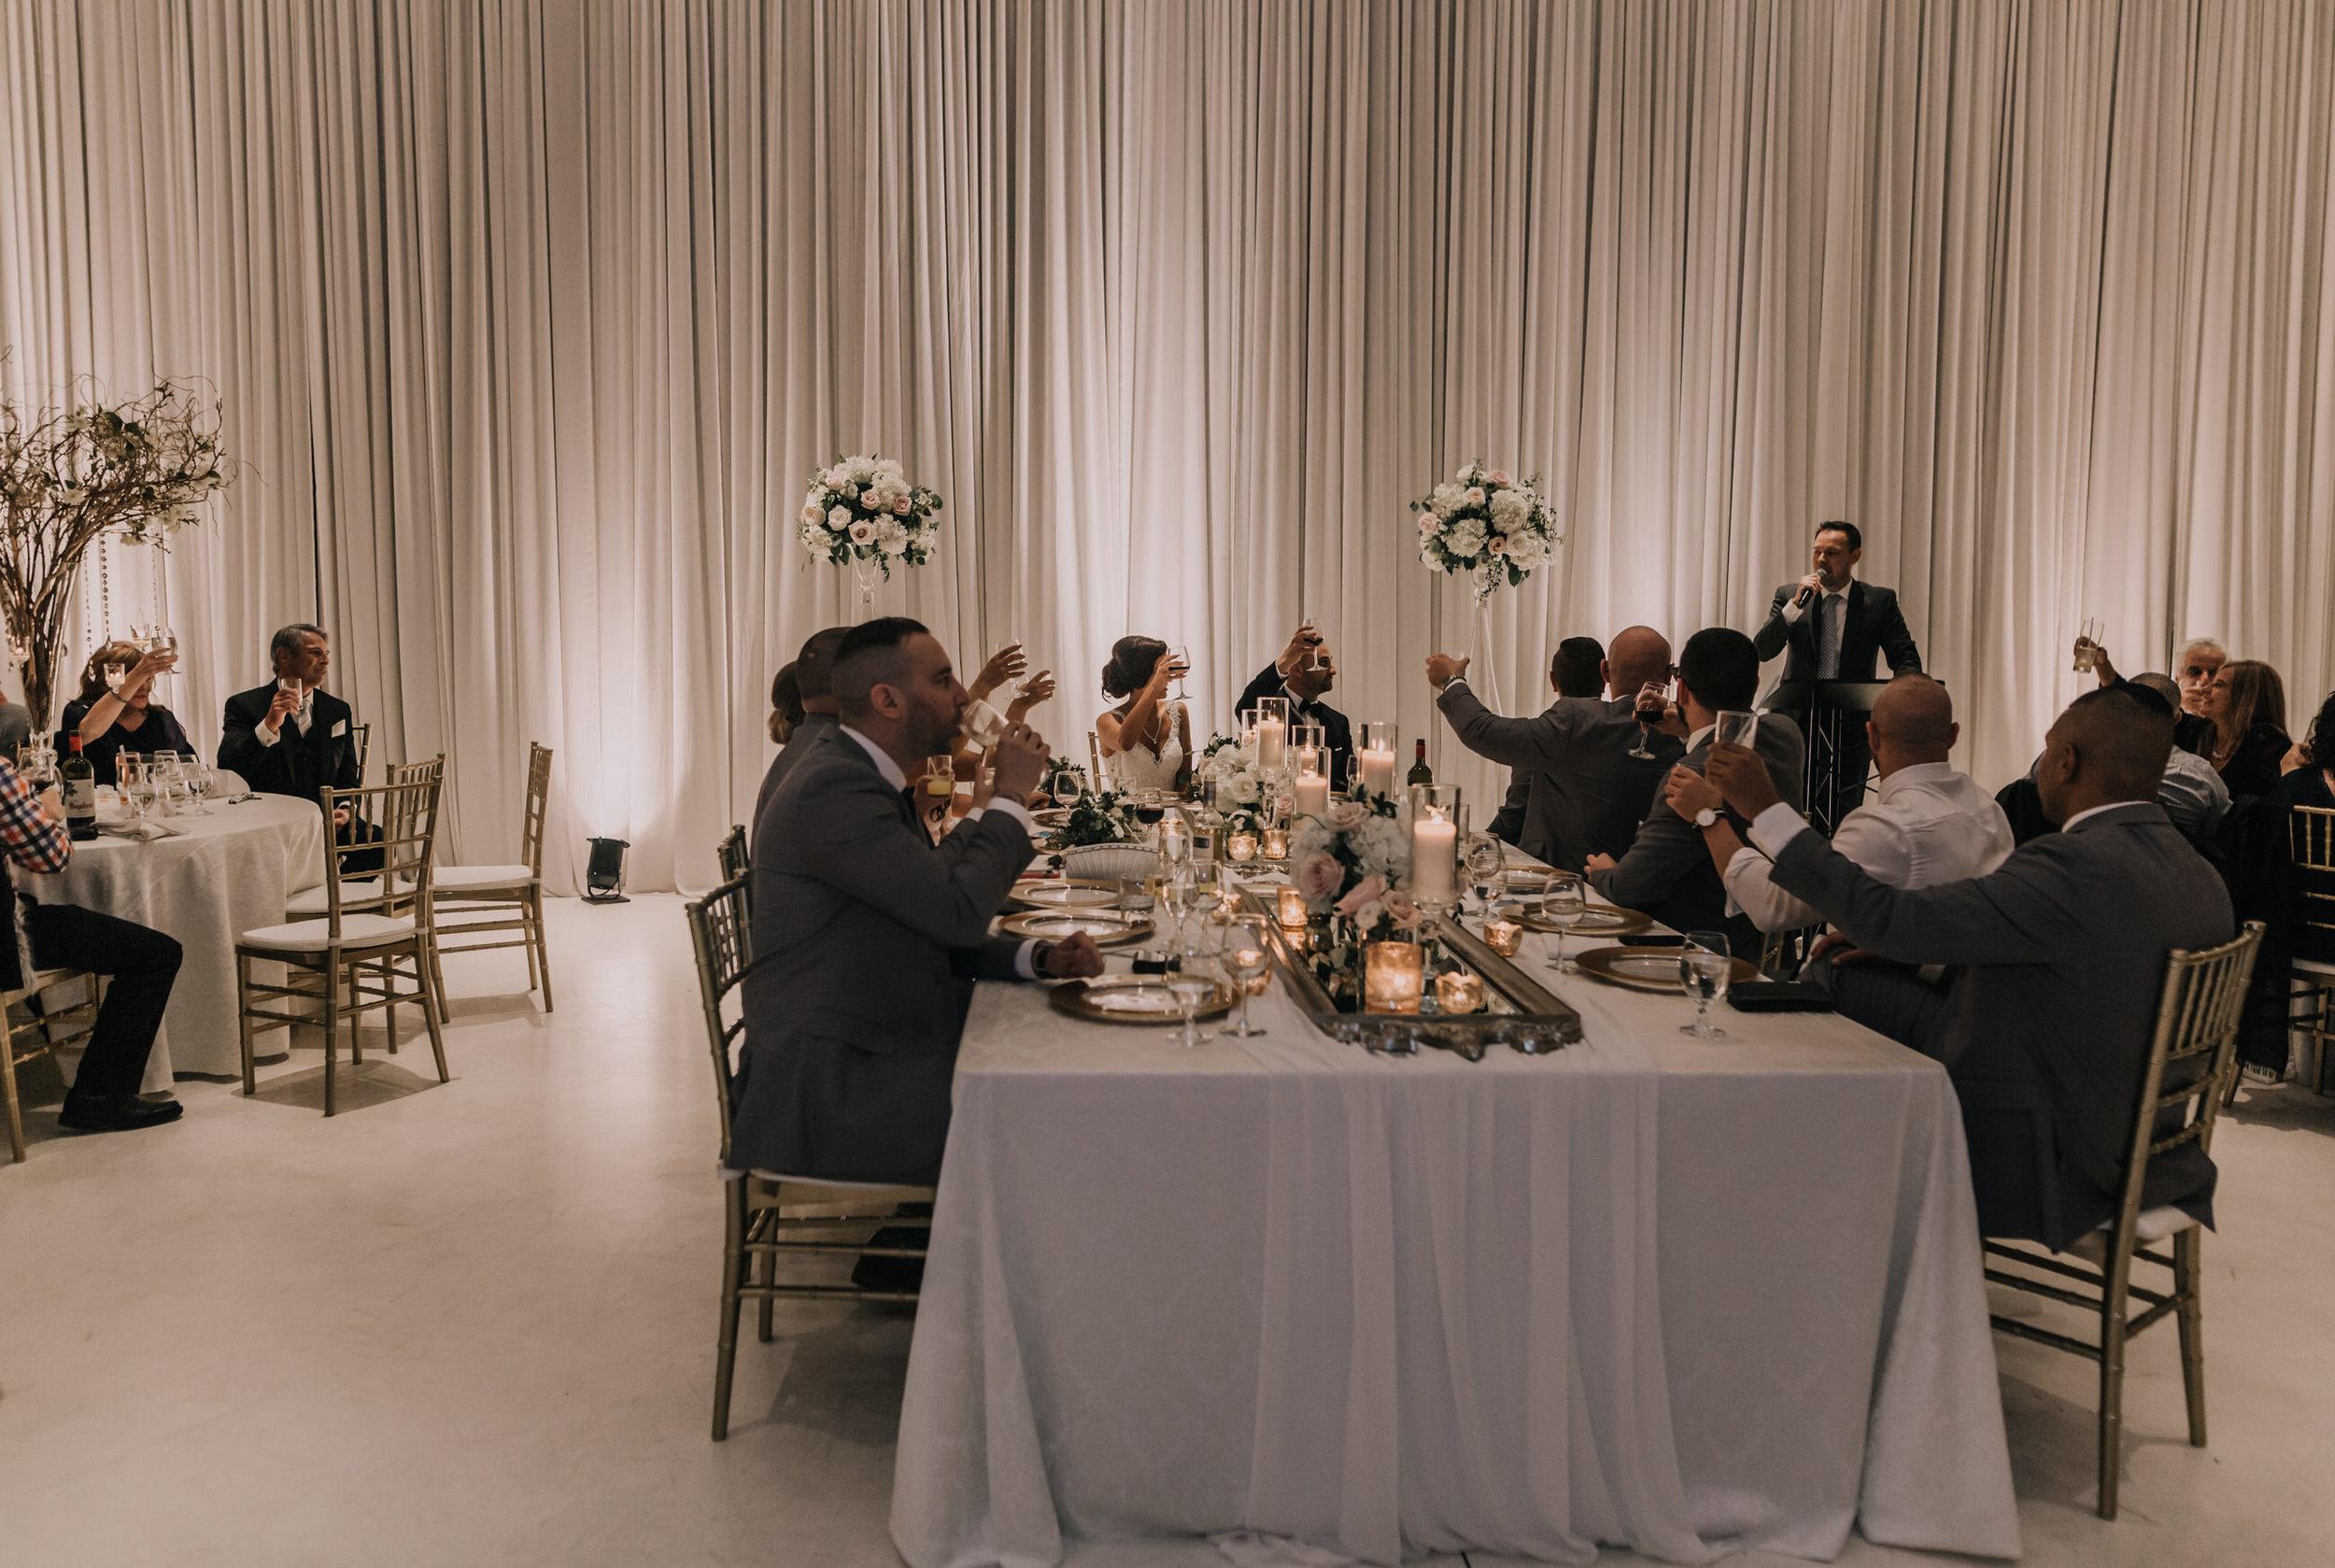 Pitt Meadows Wedding Photographer - Sky Hangar Wedding Photos - Vancouver Wedding Photographer & Videographer - Sunshine Coast Wedding Photos - Sunshine Coast Wedding Photographer - Jennifer Picard Photography - IMG_6509.jpg